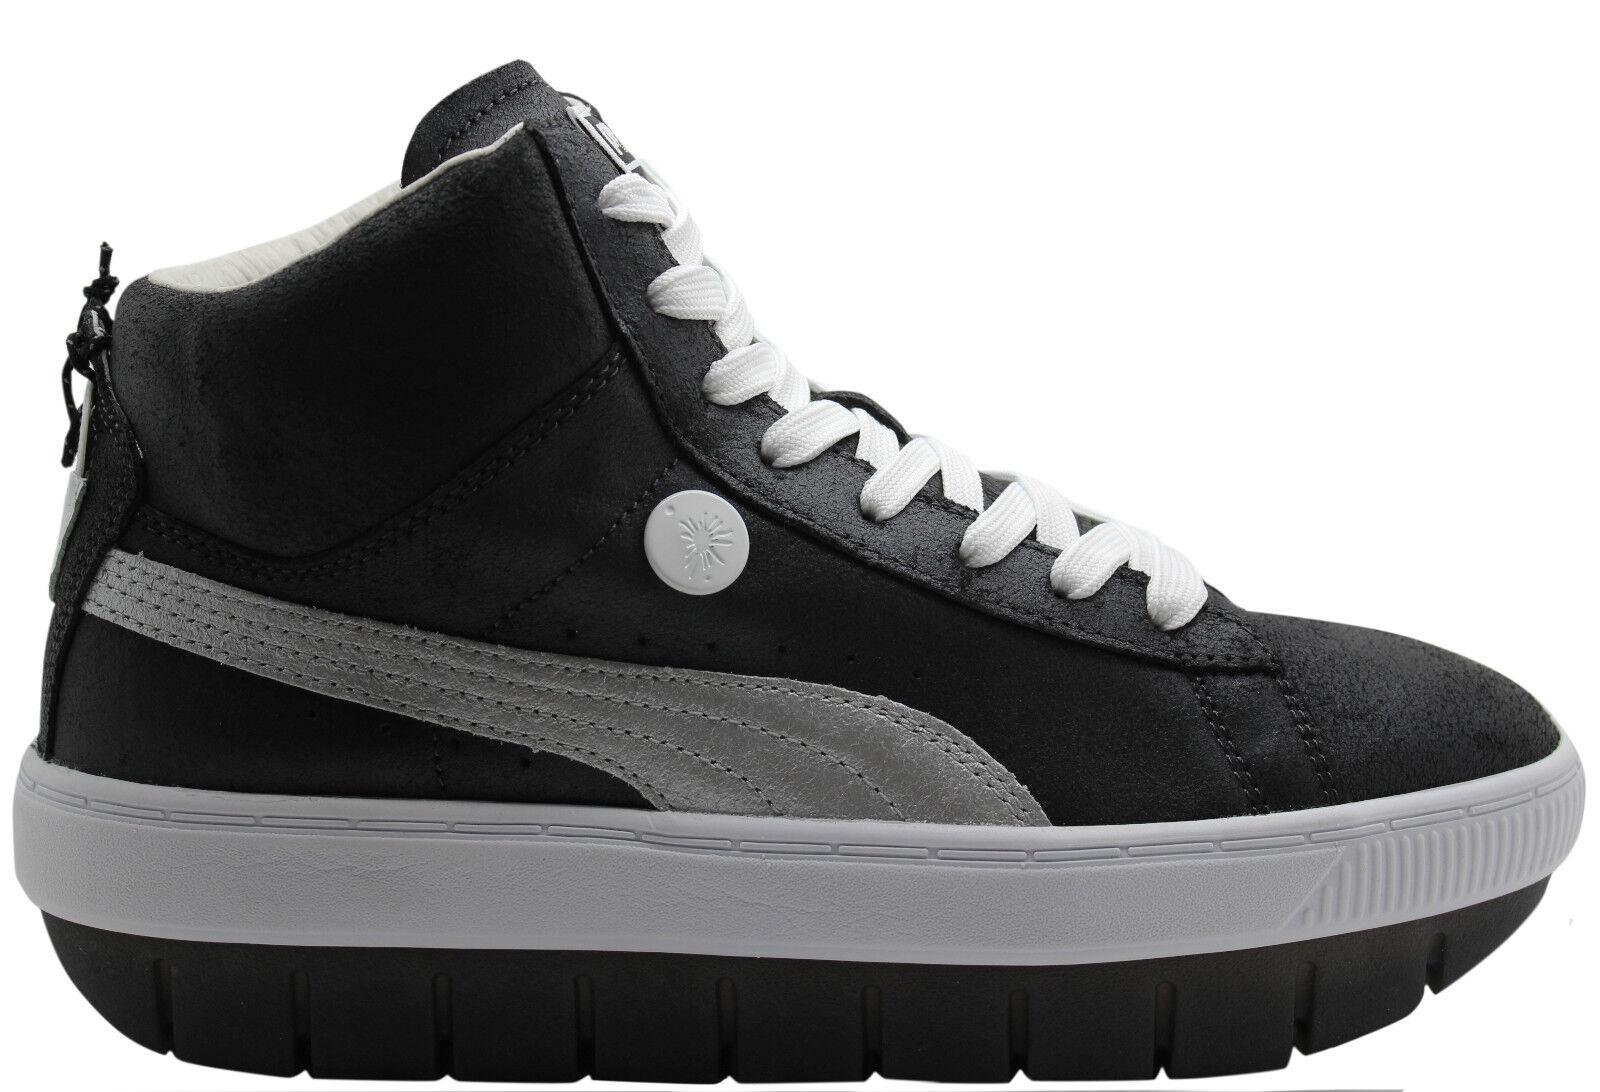 Zapatos promocionales para hombres y mujeres Puma Mihara Yasuhiro MY 82 Womens Trainers Black Leather 357085 01 P2